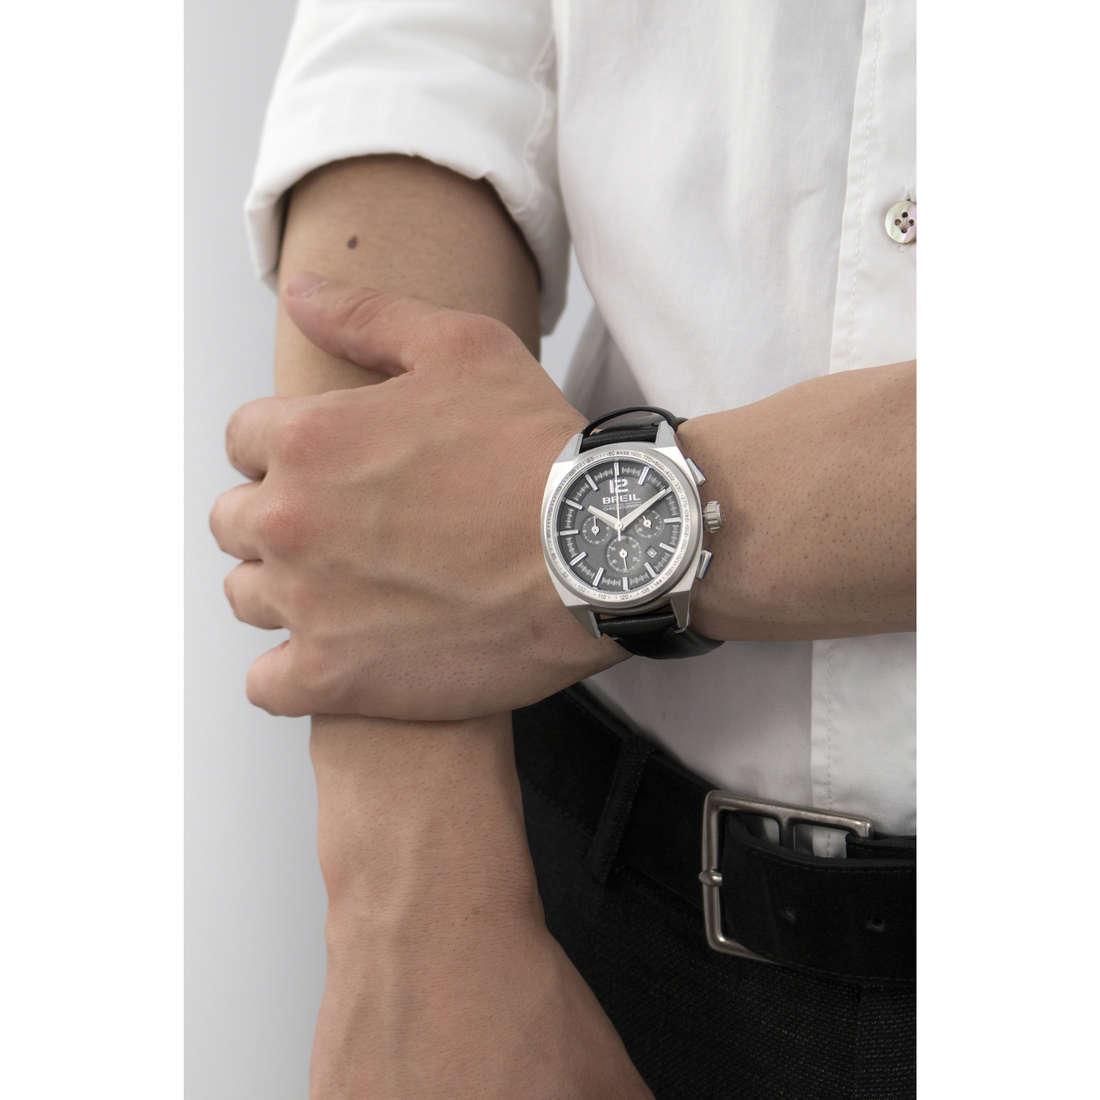 Breil cronografi Master uomo TW1459 indosso